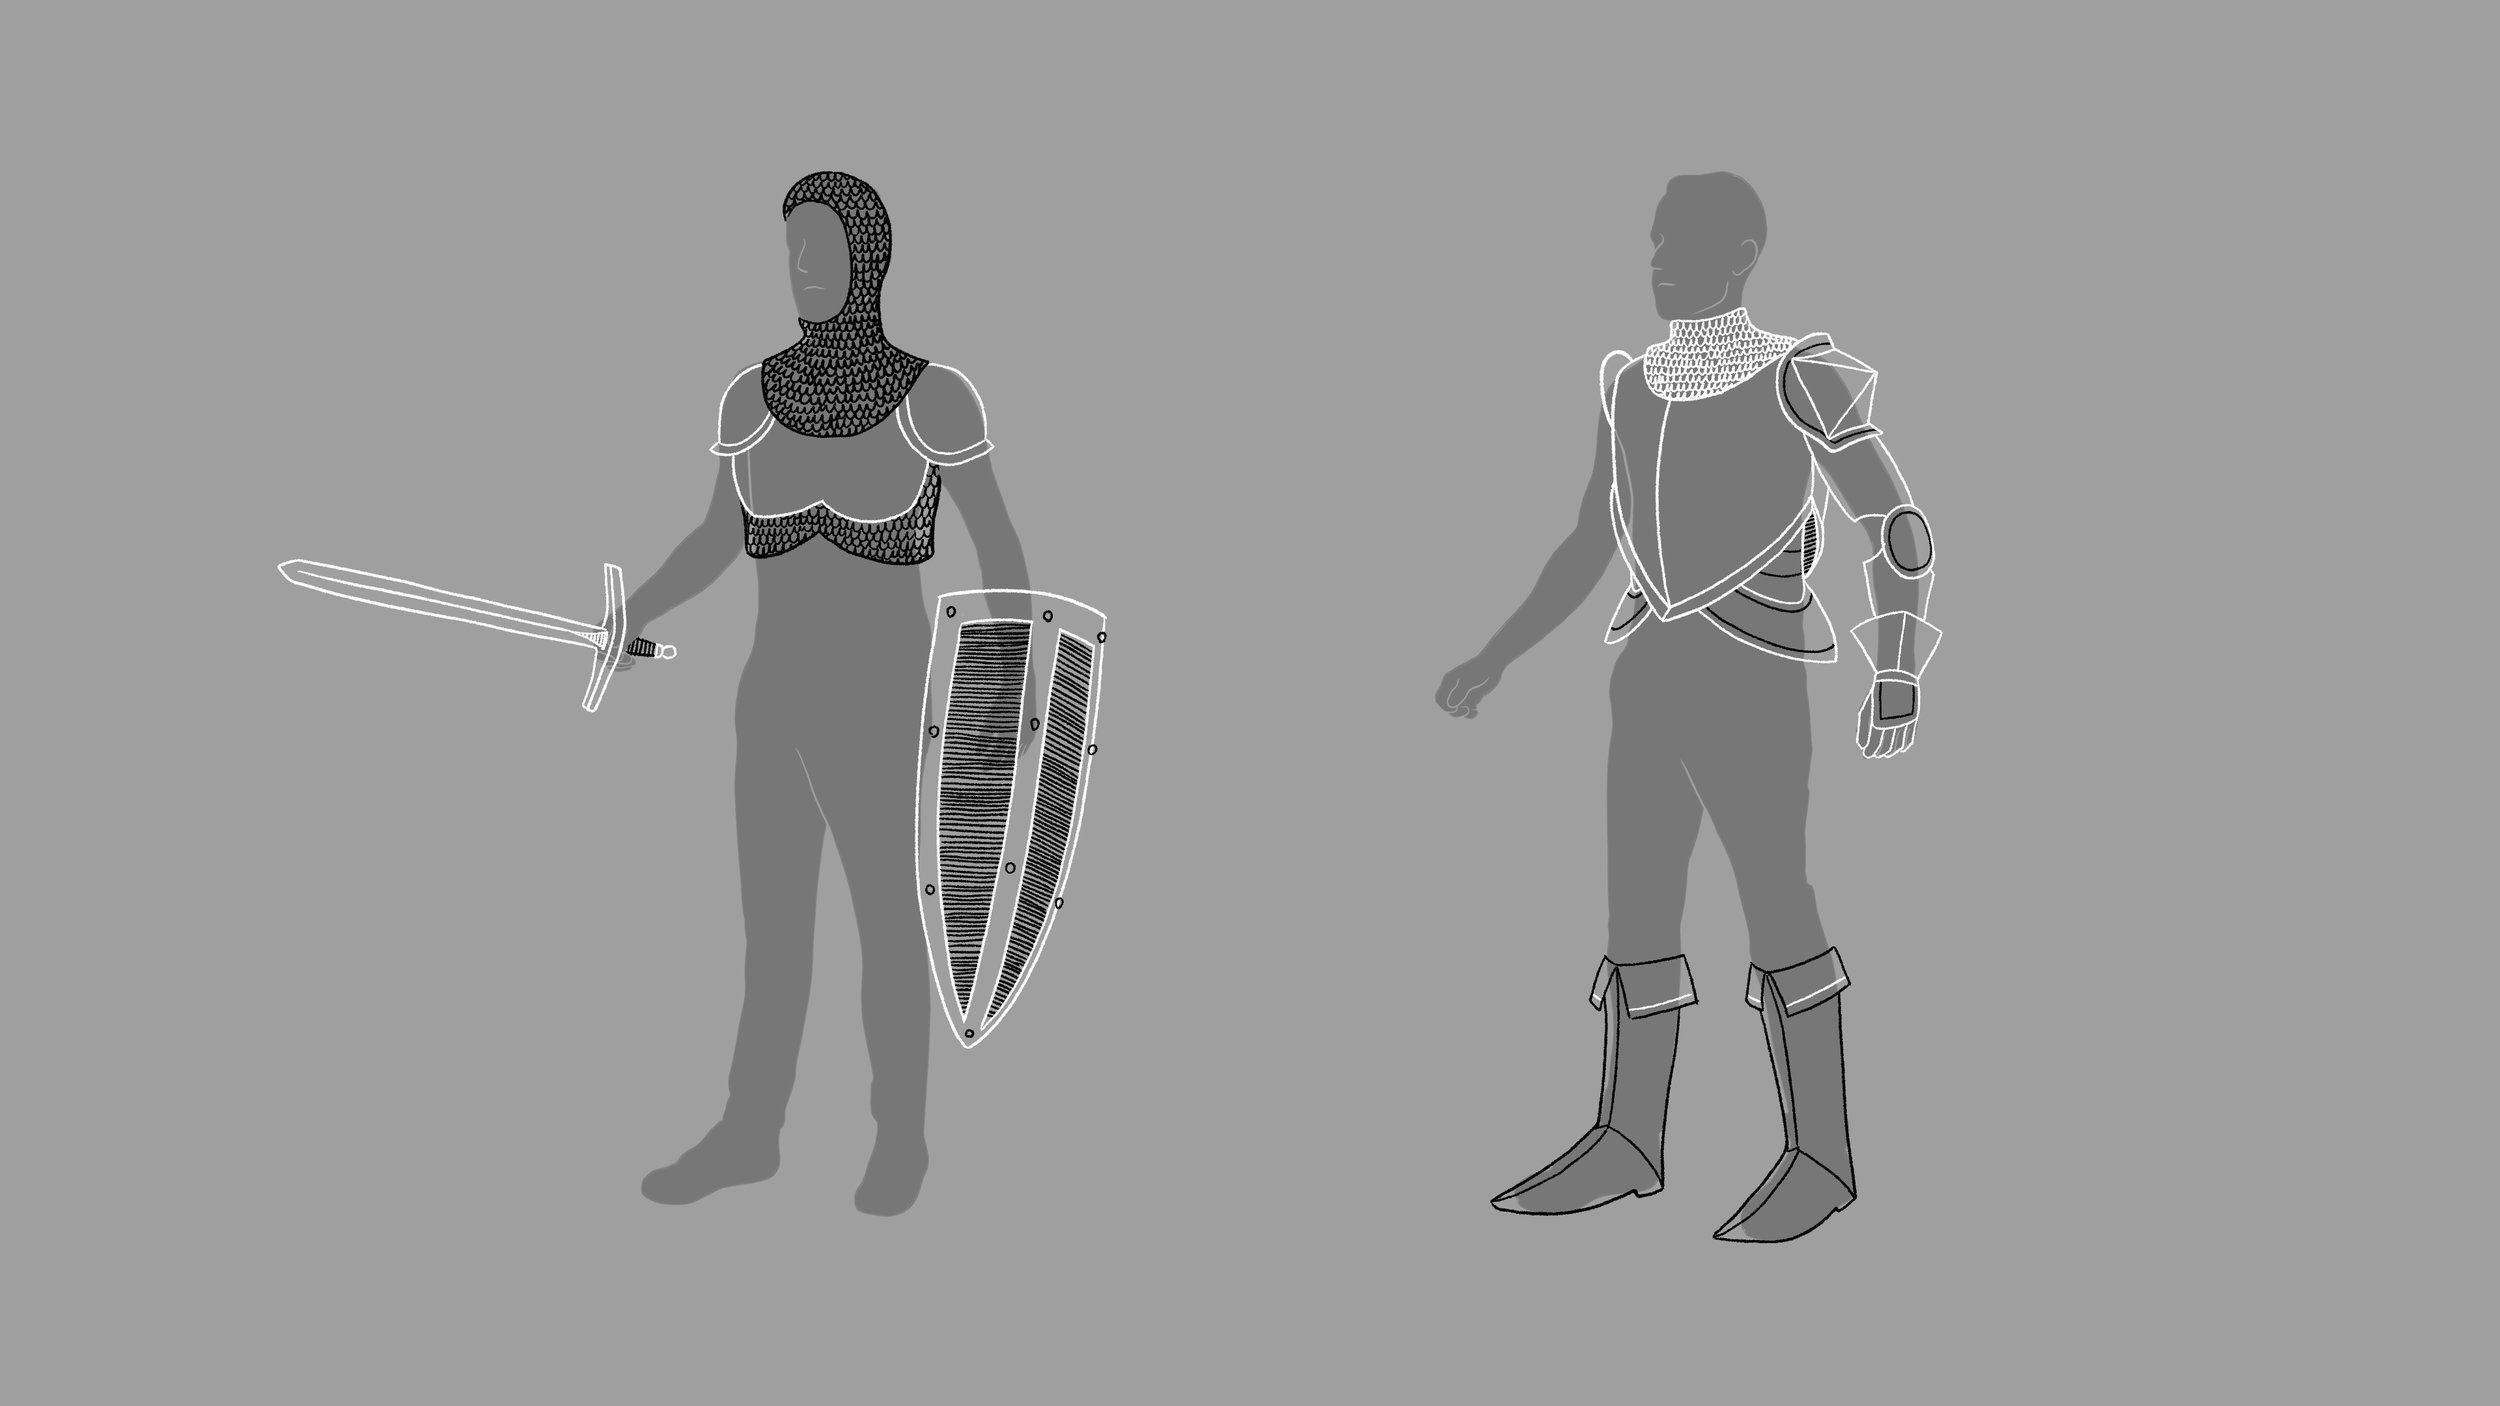 Knights_2_004.jpg